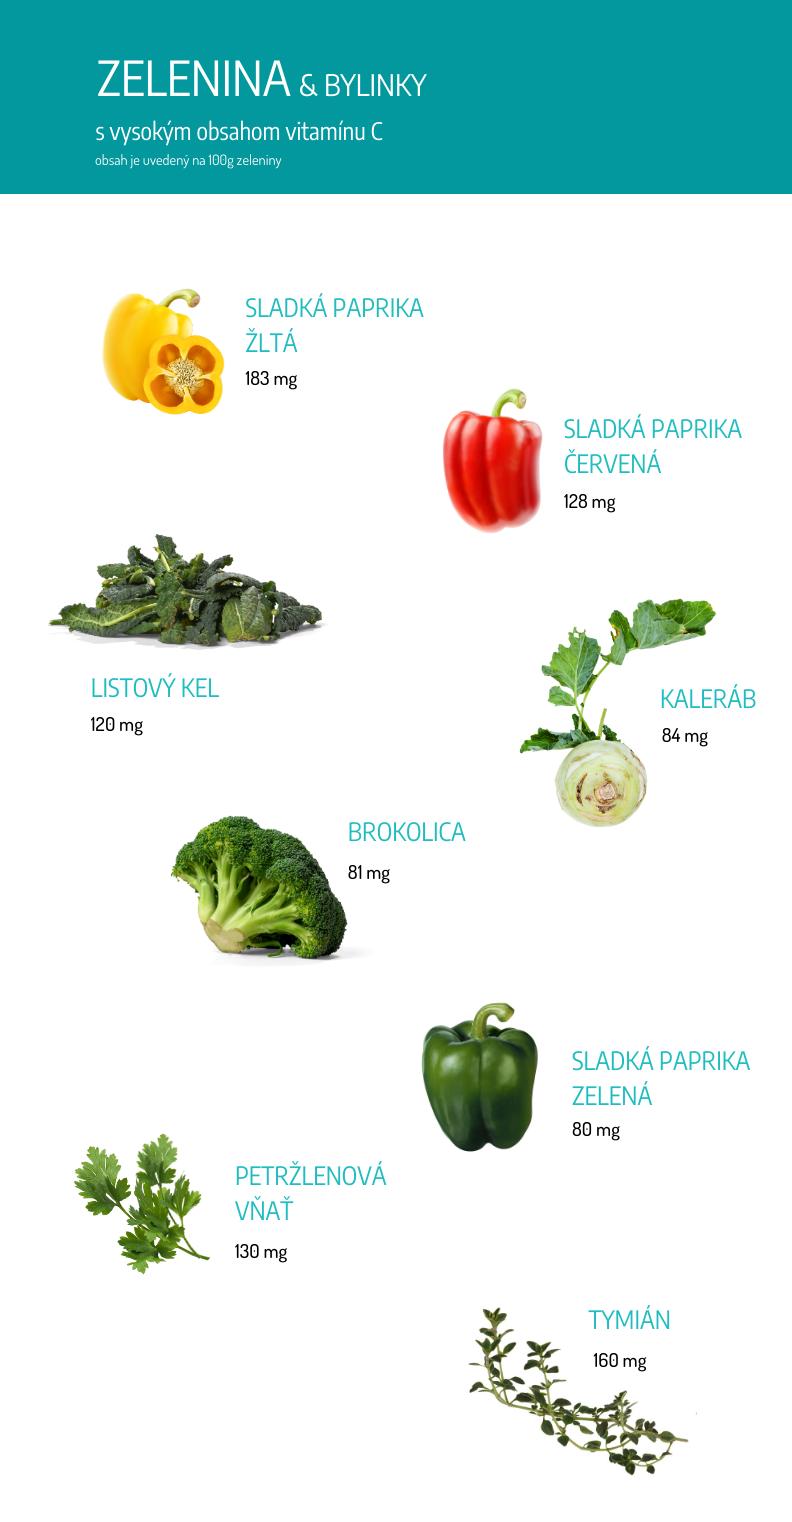 Zelenina s obsahom vitamínu C